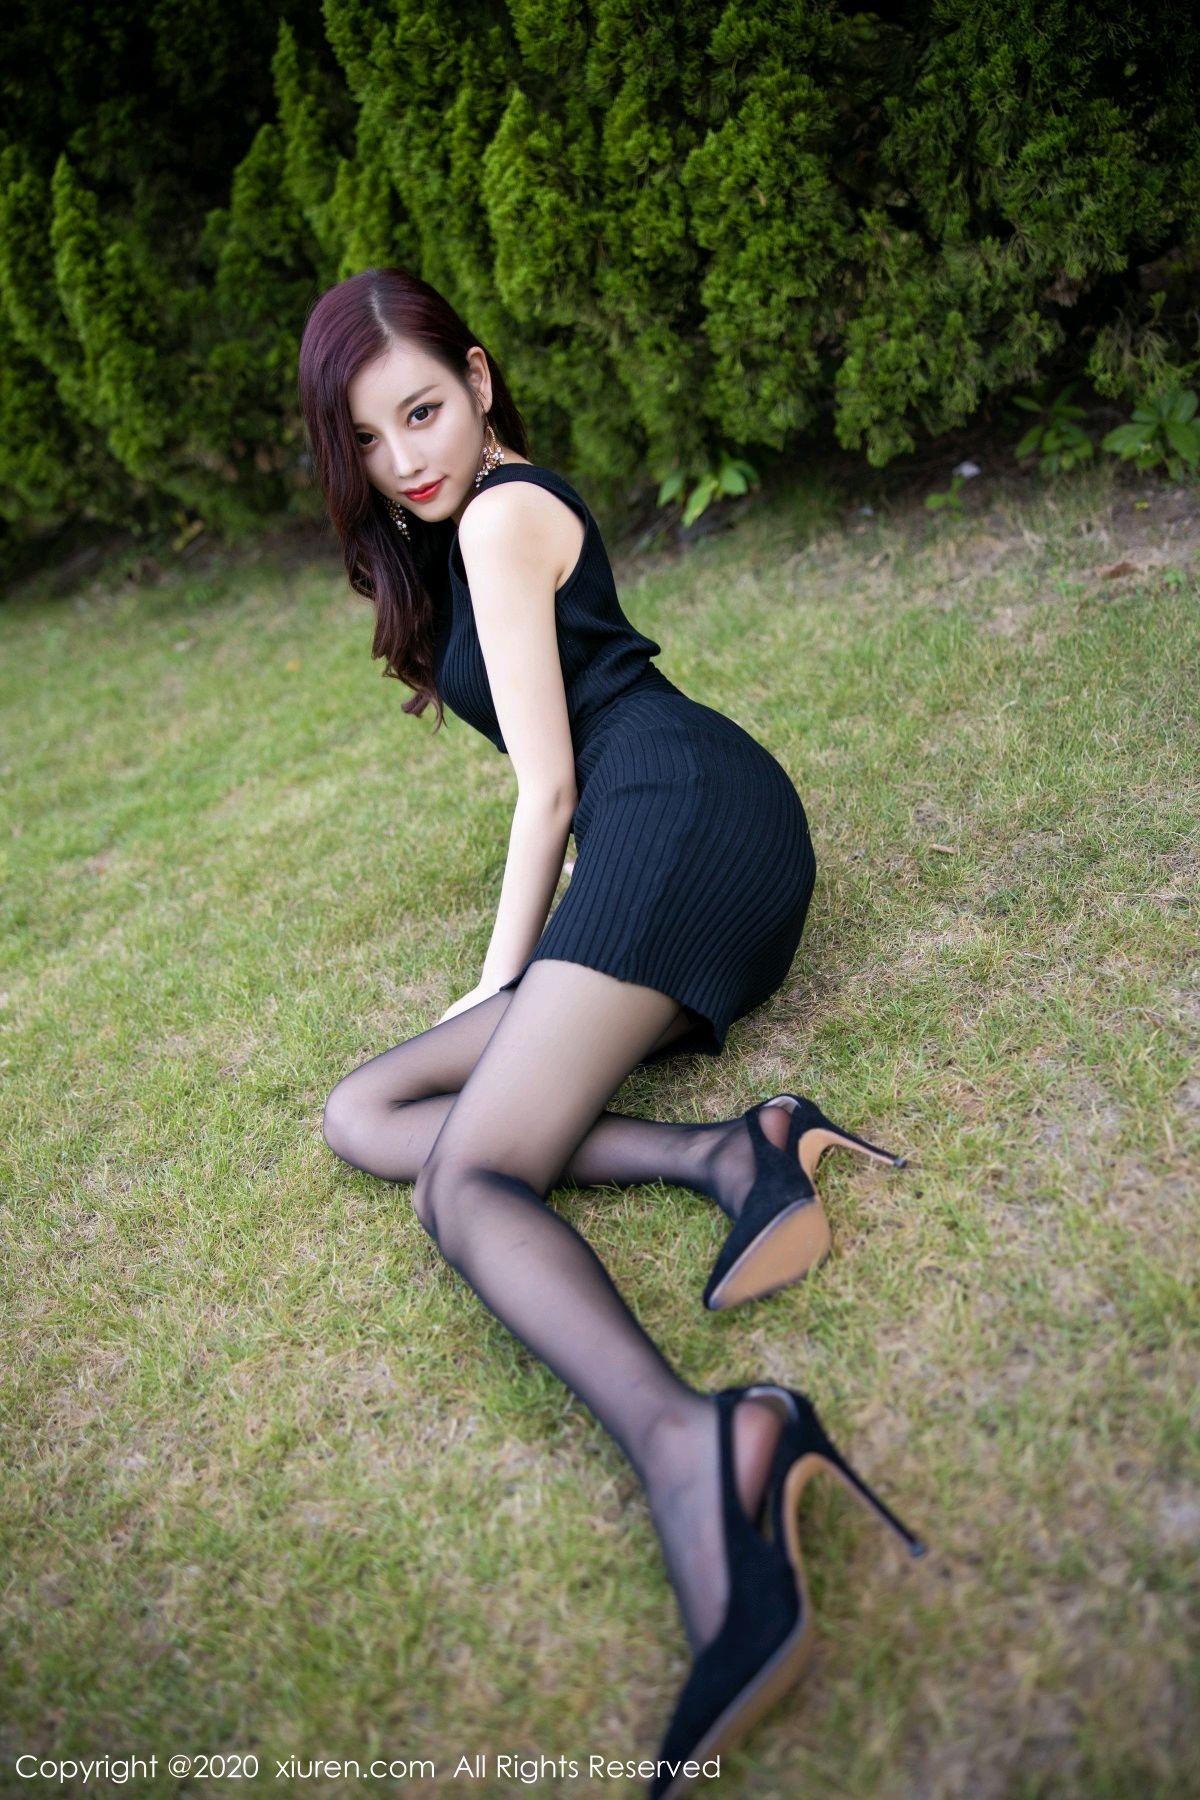 [XiuRen] Vol.2648 Yang Chen Chen 28P, Black Silk, Outdoor, Xiuren, Yang Chen Chen